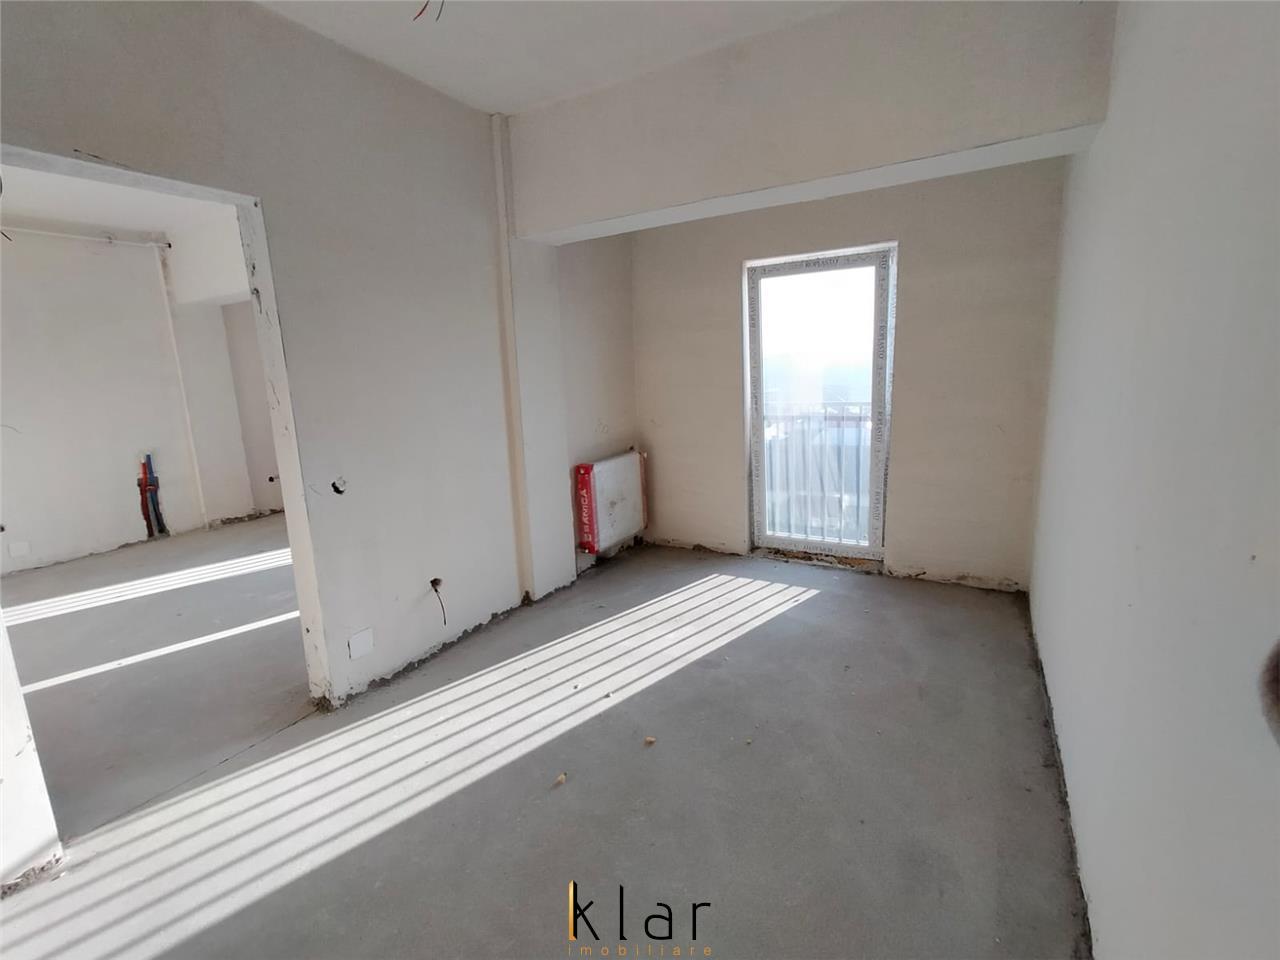 Apartament 2 camere semifinisat, bloc nou cu lift zona Balastierei